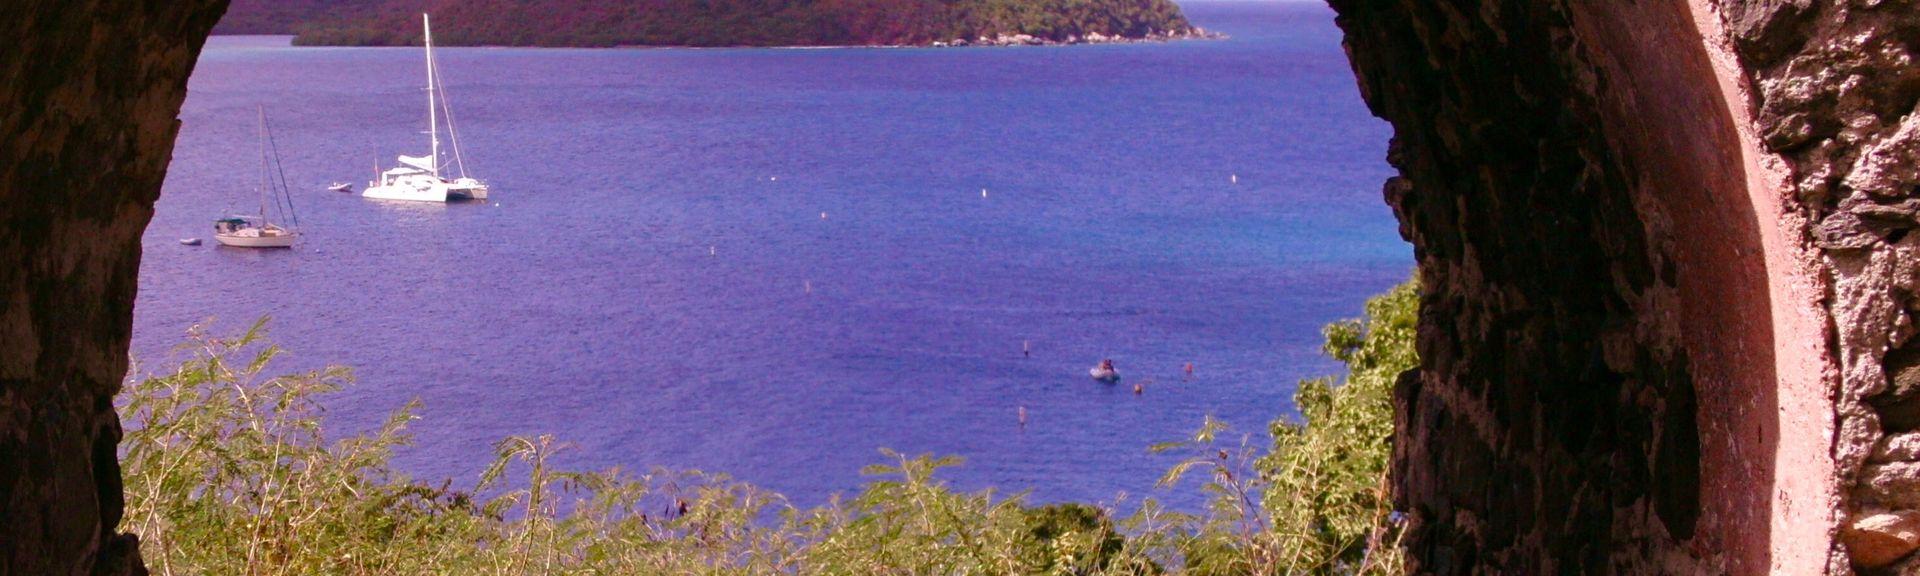 Nazareth, St. Thomas, U.S. Virgin Islands